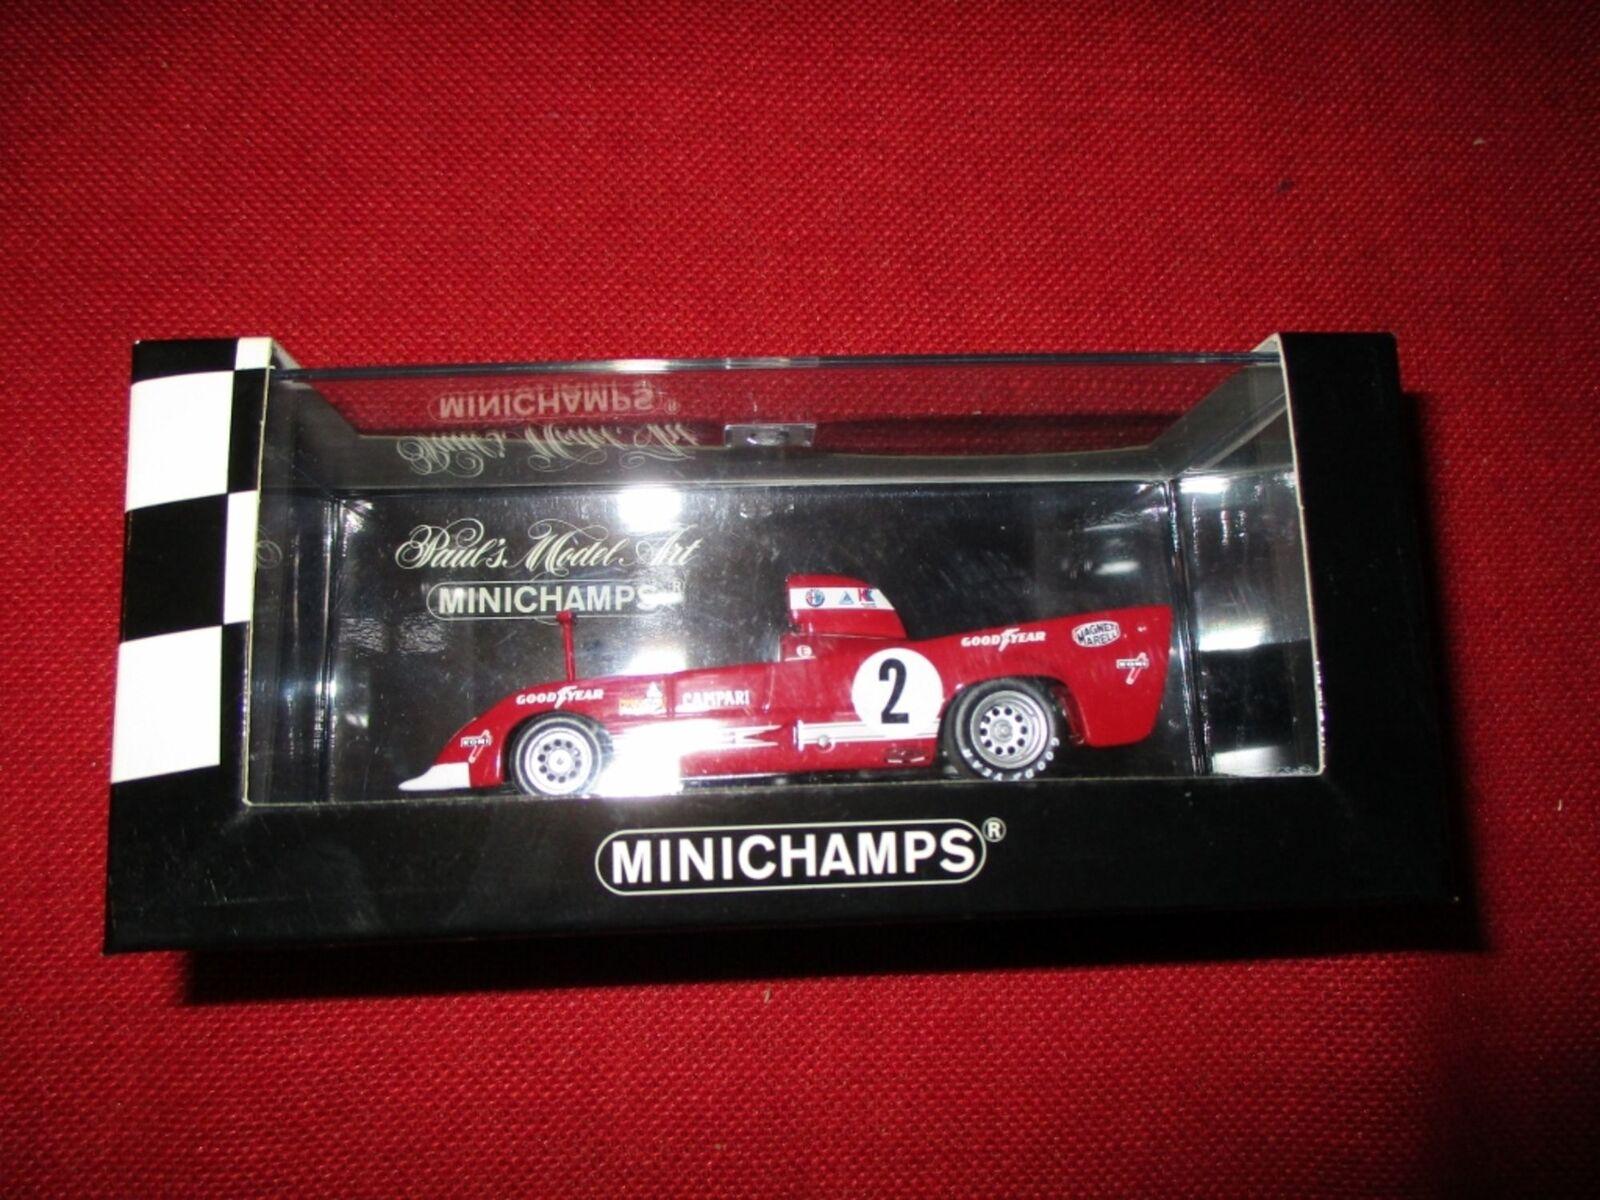 MINICHAMPS ® 400 751202 1 43 ALFA ROMEO 33 TT 12 Pescarolo Bell Team WKRT NEUF